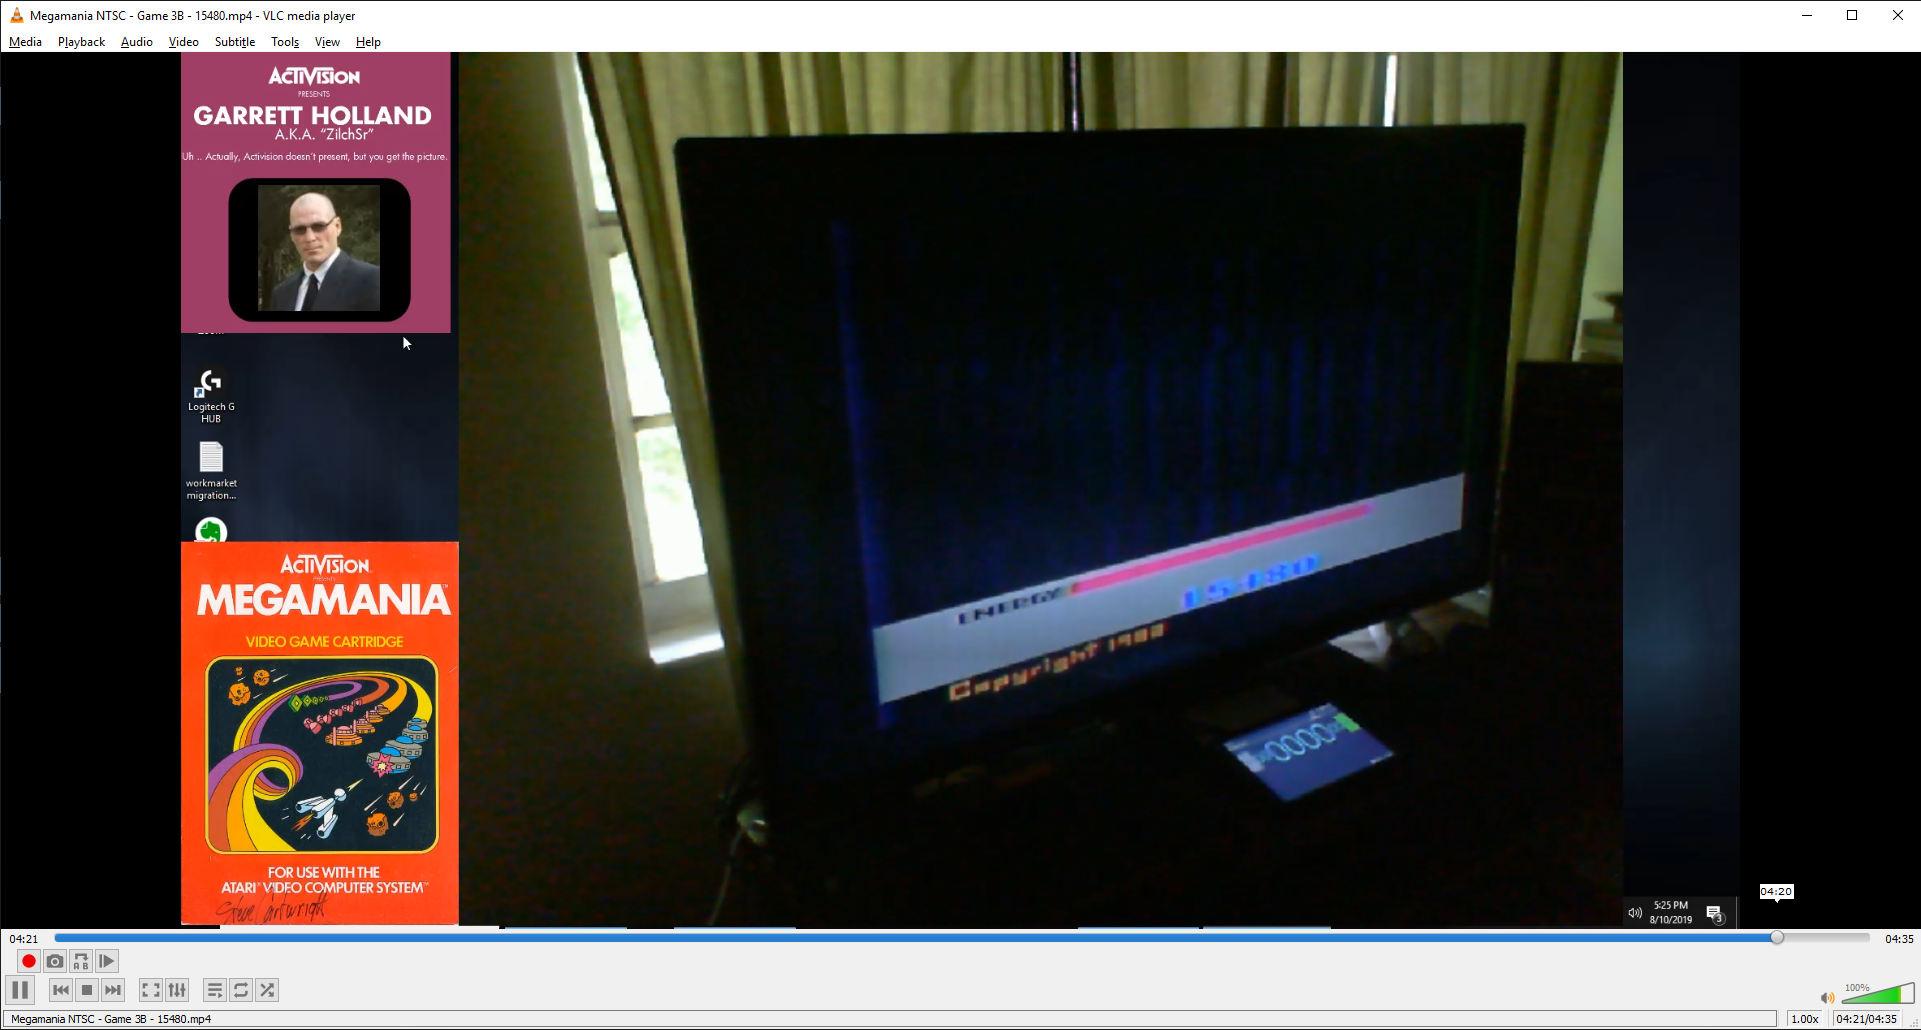 ZilchSr: Megamania: Game 3 [Straight Missiles] (Atari 2600) 15,480 points on 2019-08-10 16:30:35